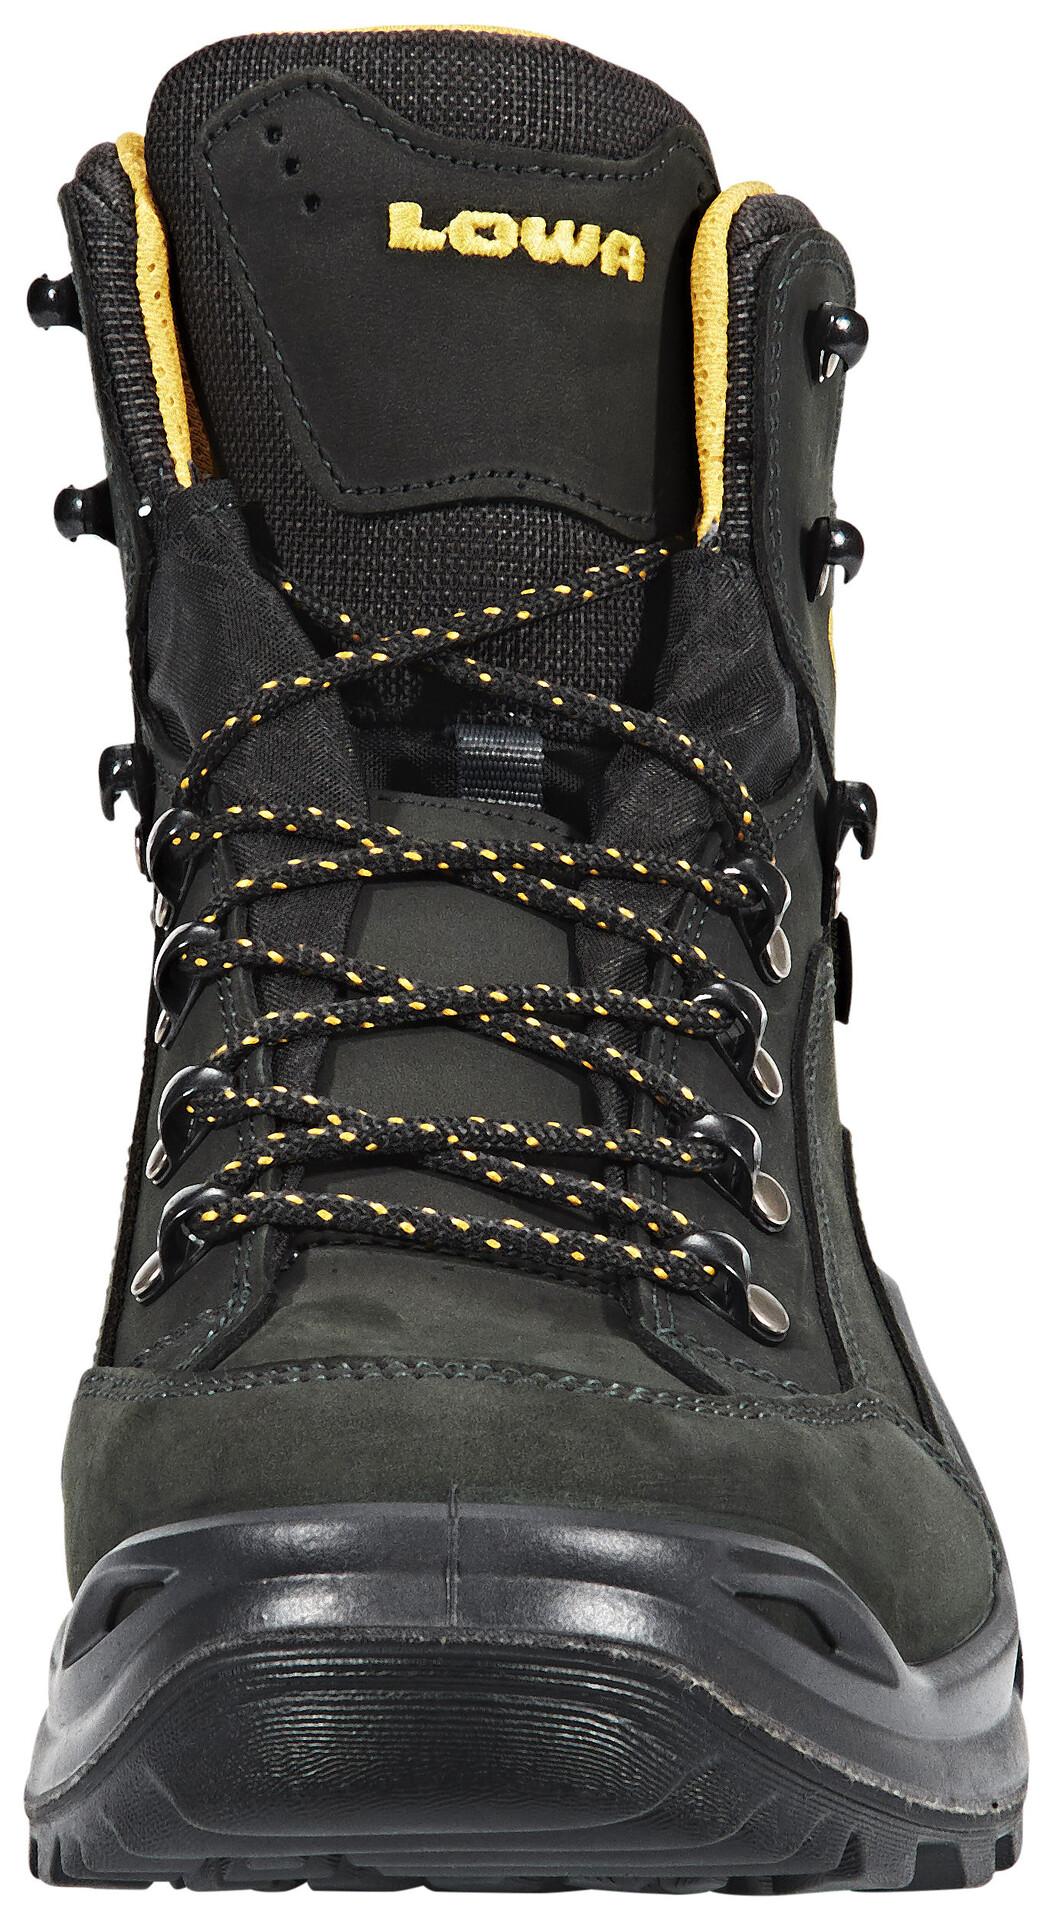 Lowa HommeB HommeB Lowa Chaussures Montantes Lowa Chaussures Chaussures Montantes Pour Pour k8OPwX0Nn